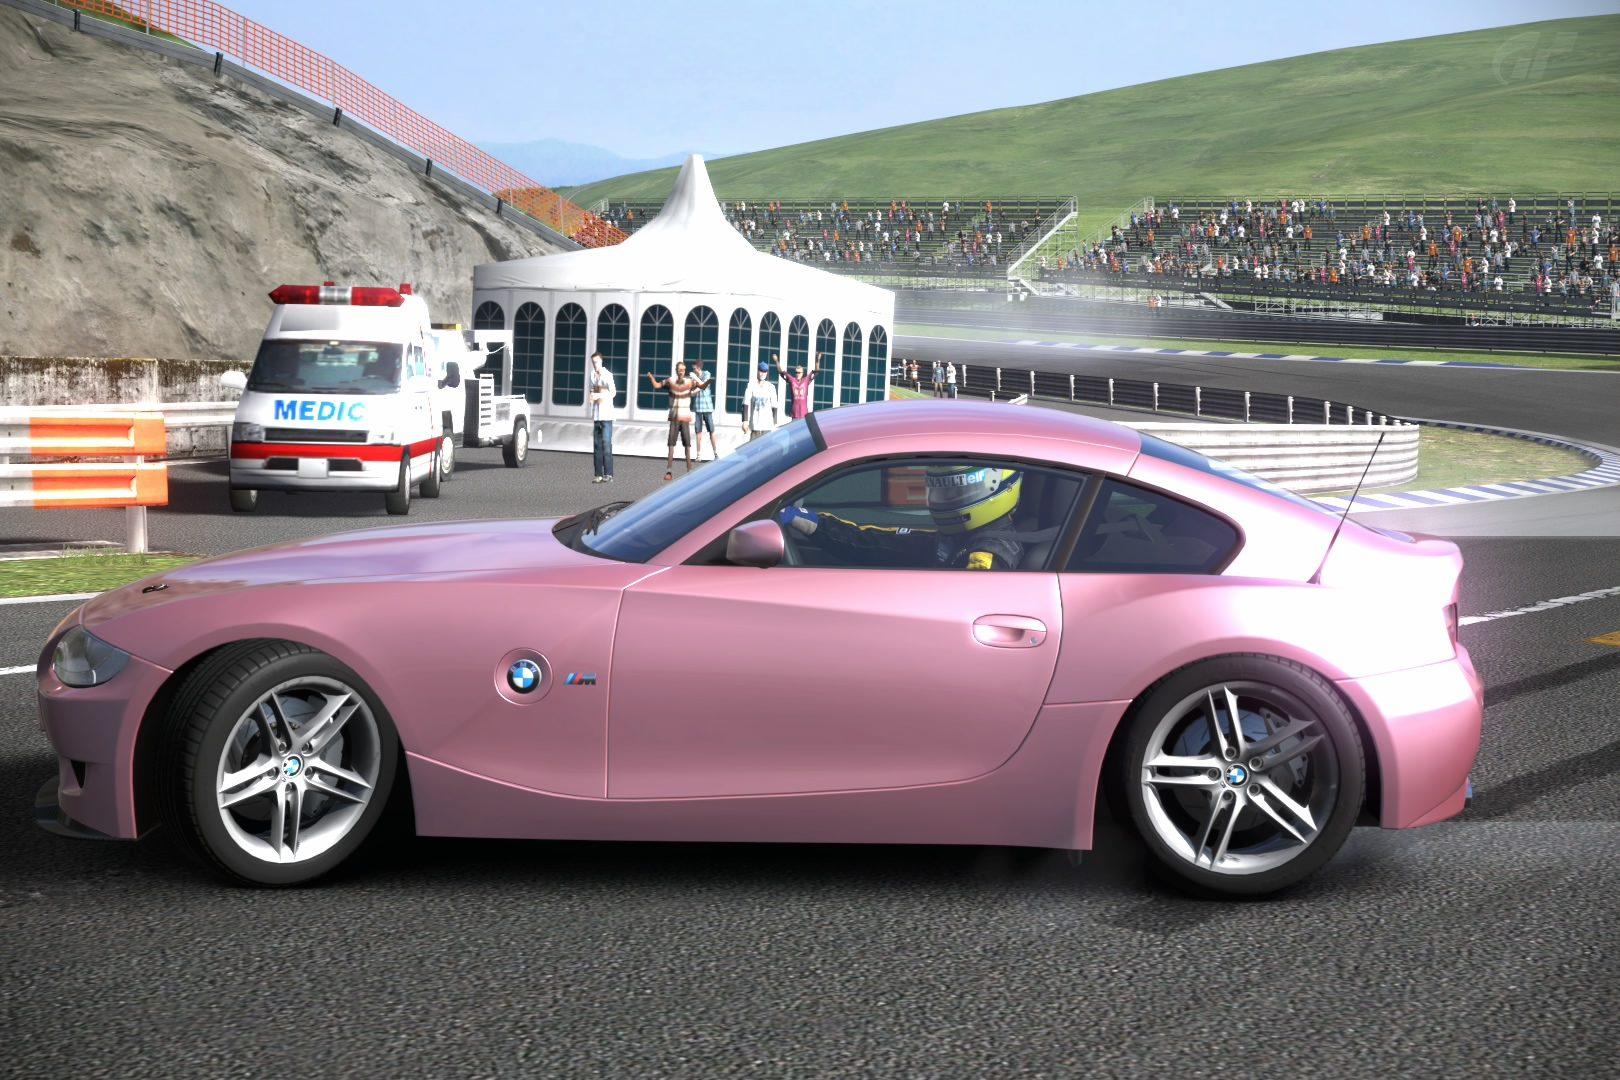 BMWPinkImg4.jpg